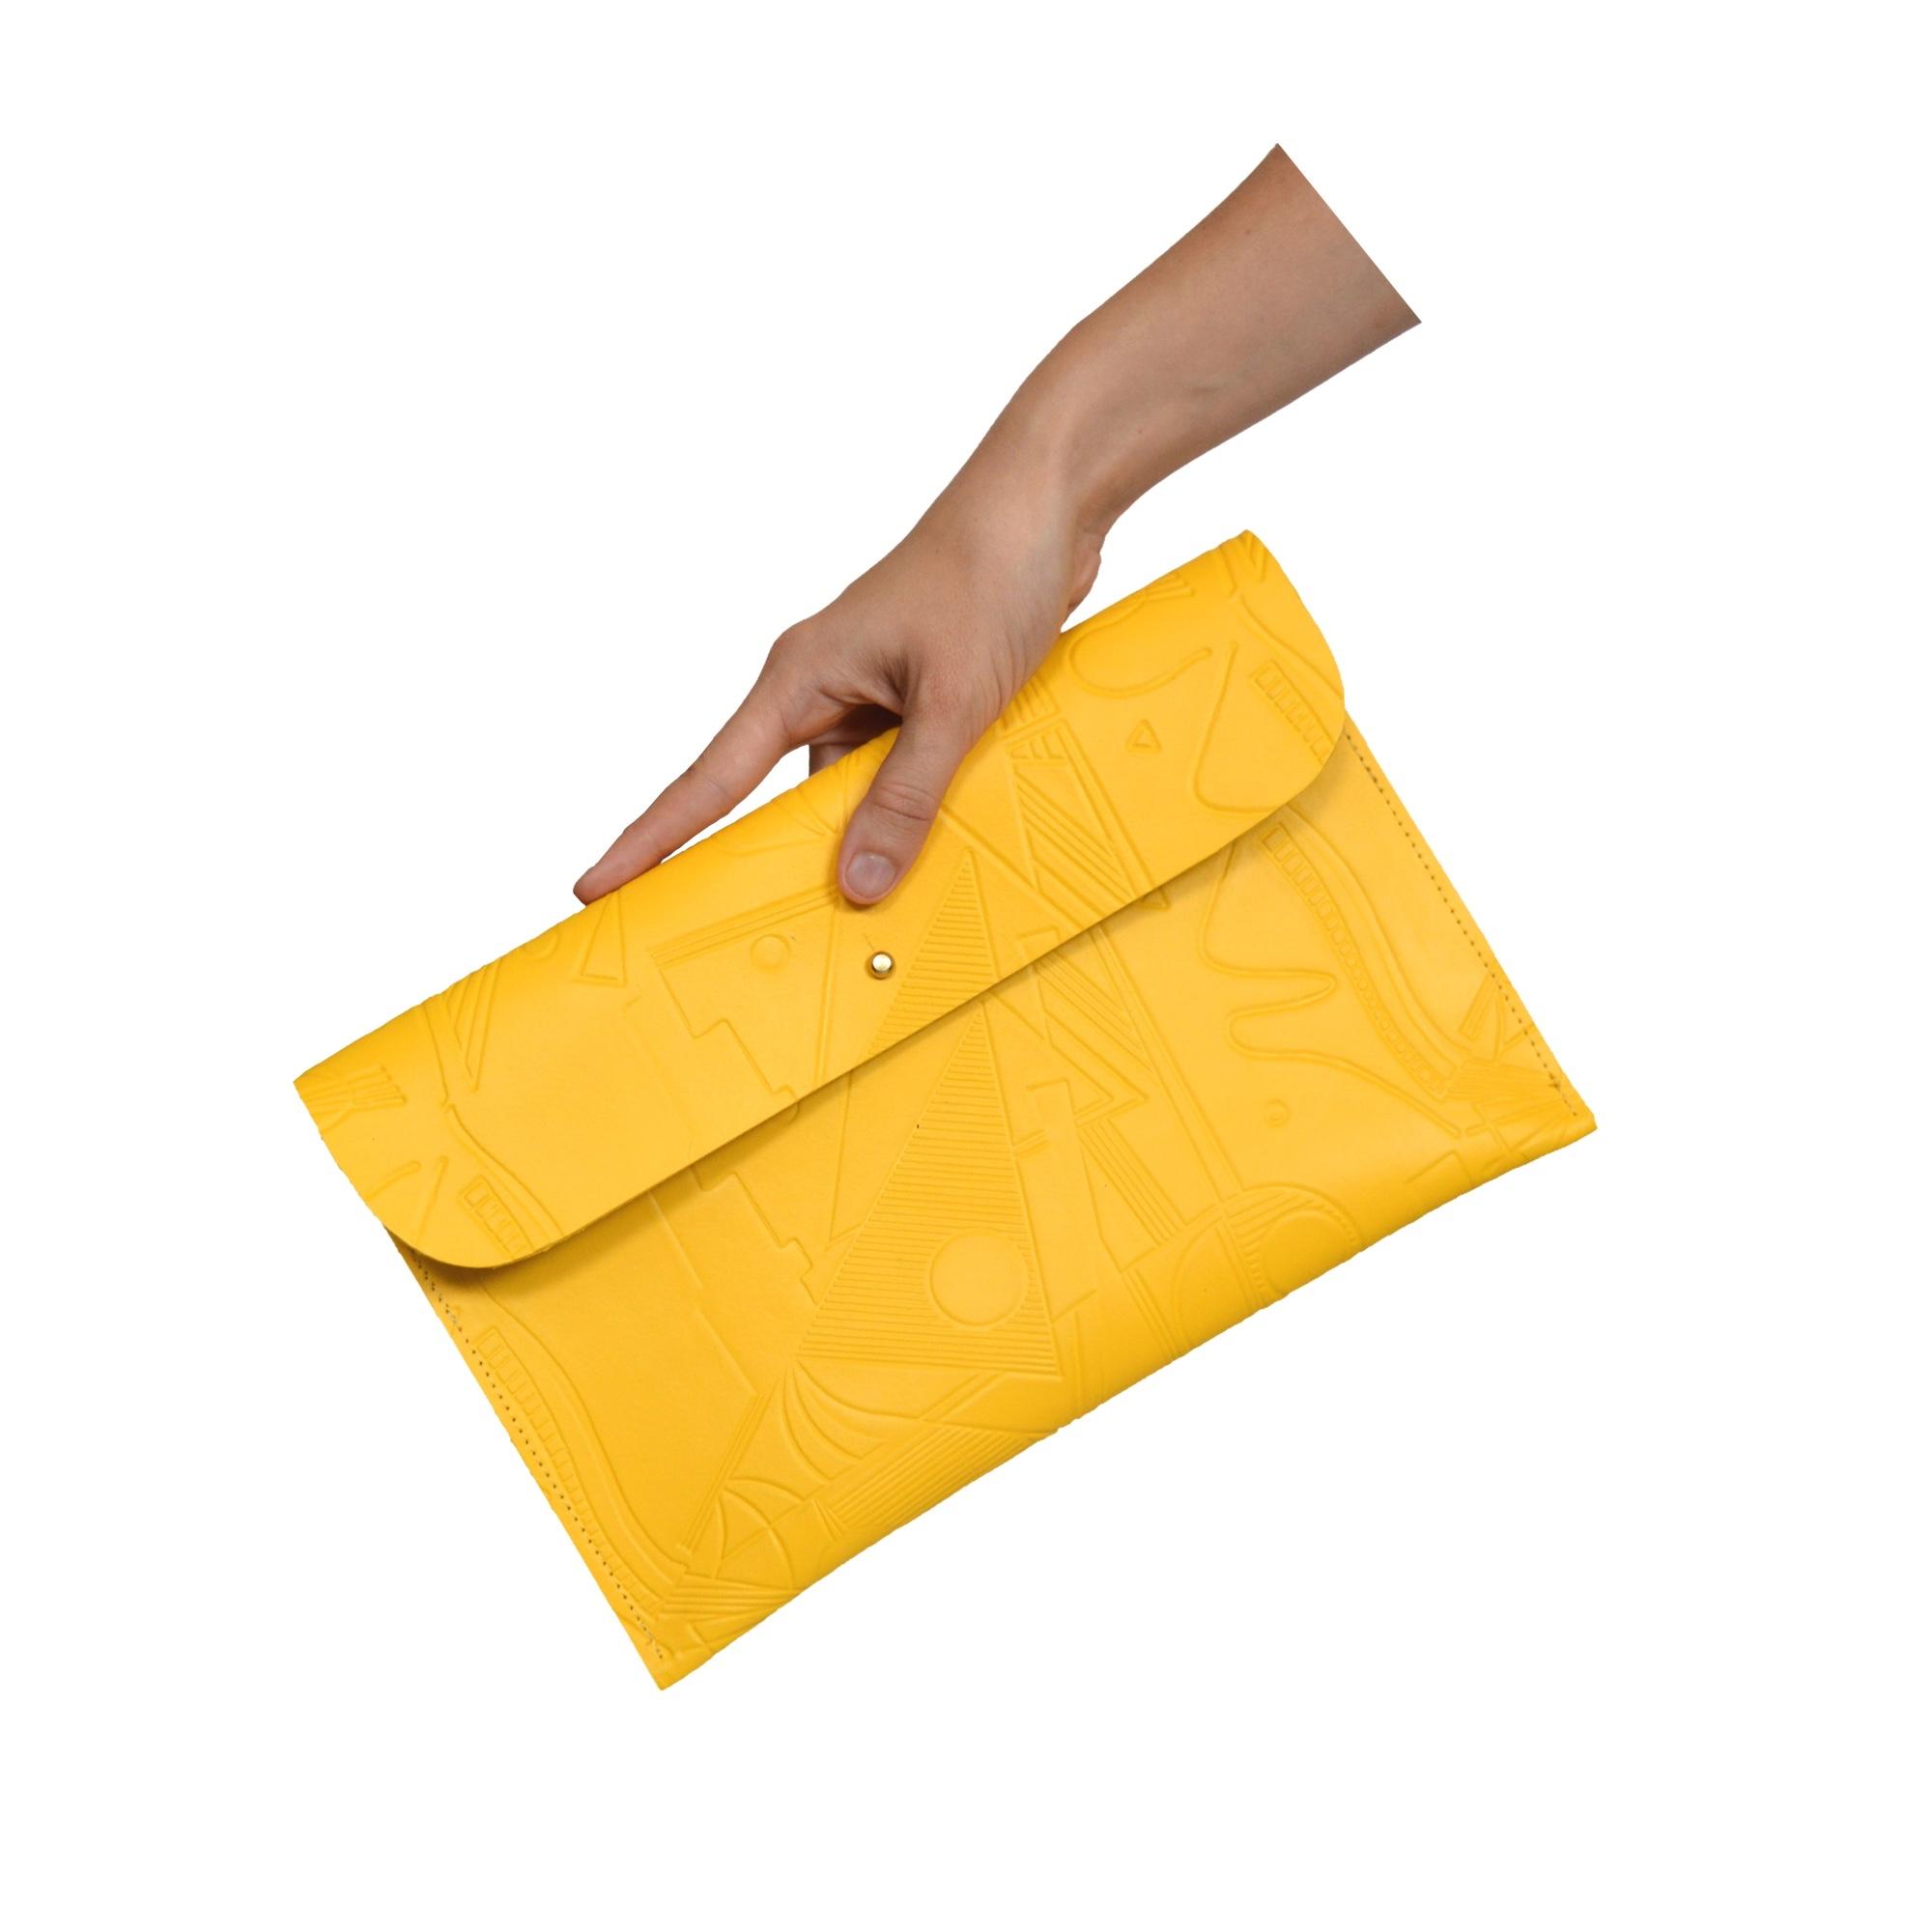 clutch hand square.jpg